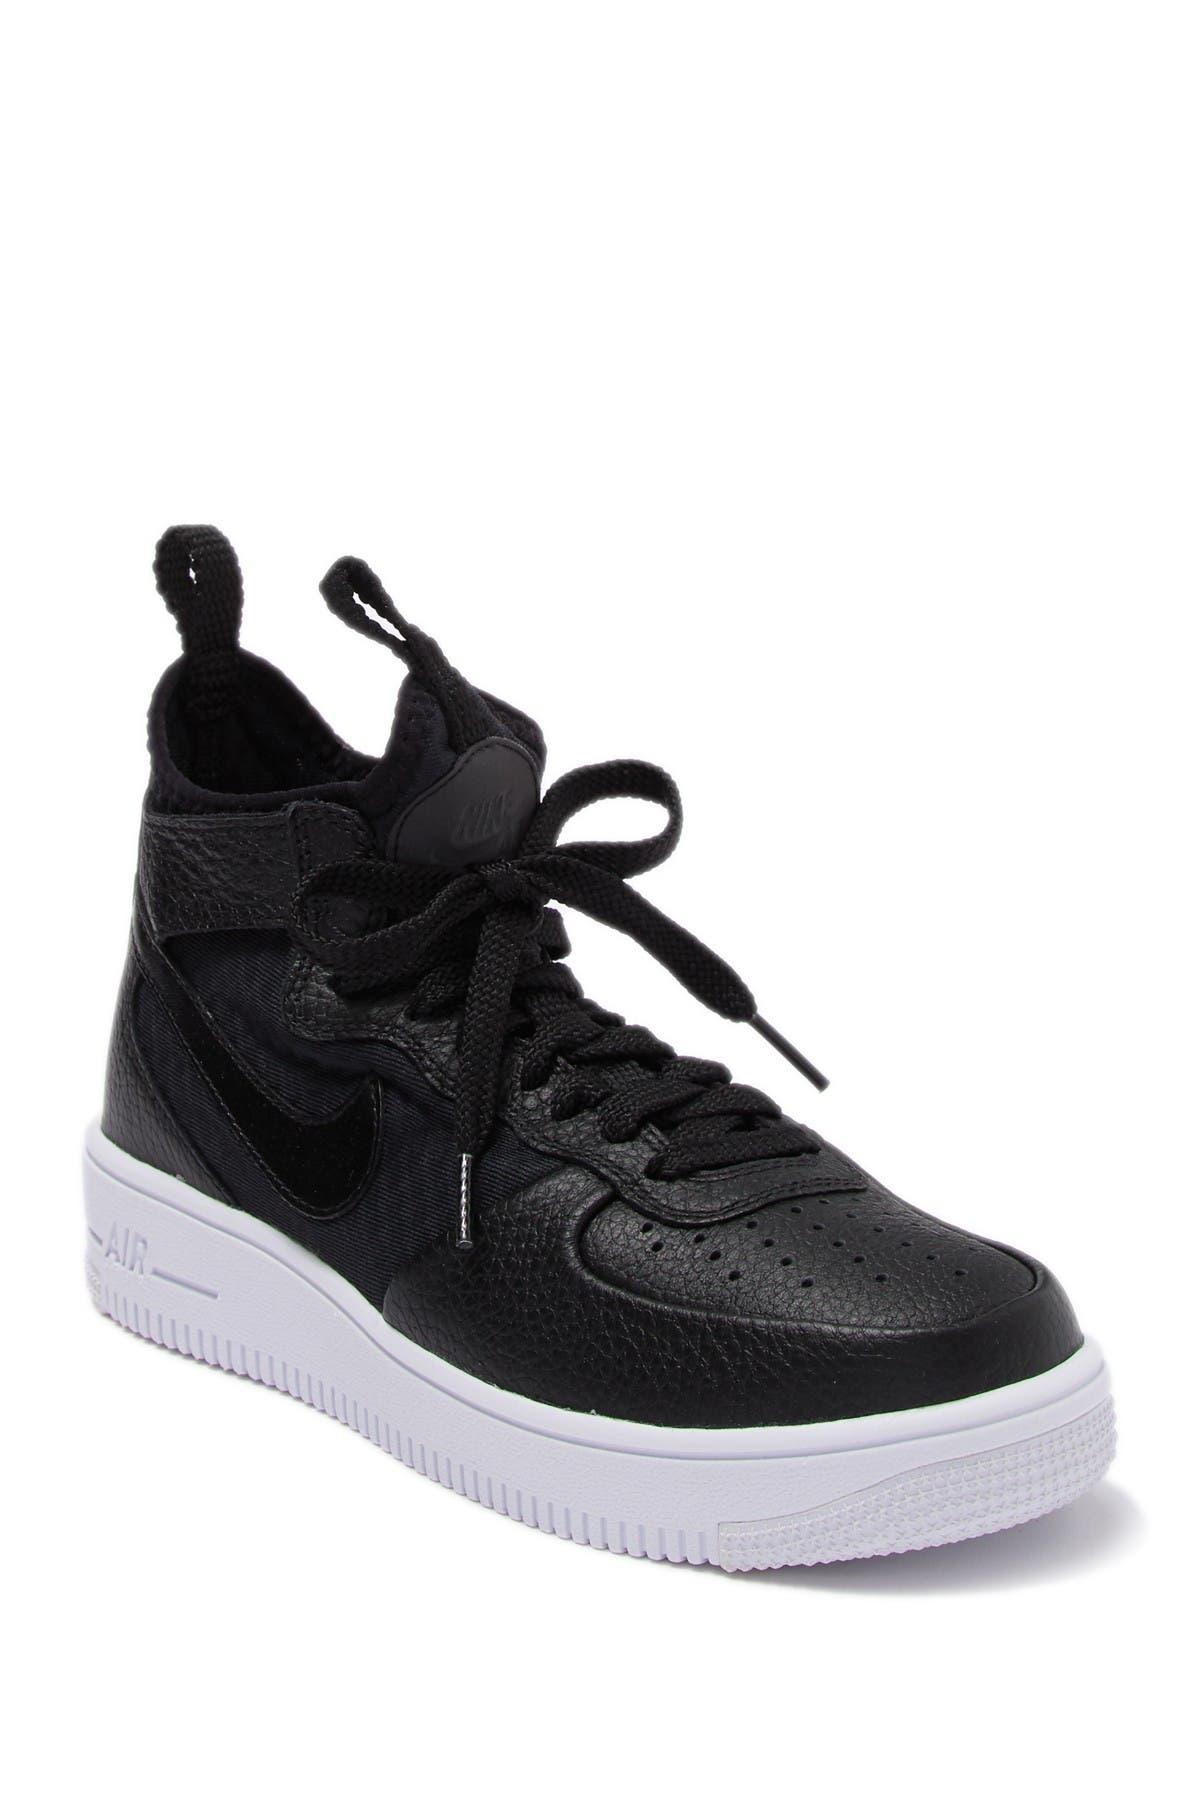 Nike | Air Force 1 Ultraforce Mid